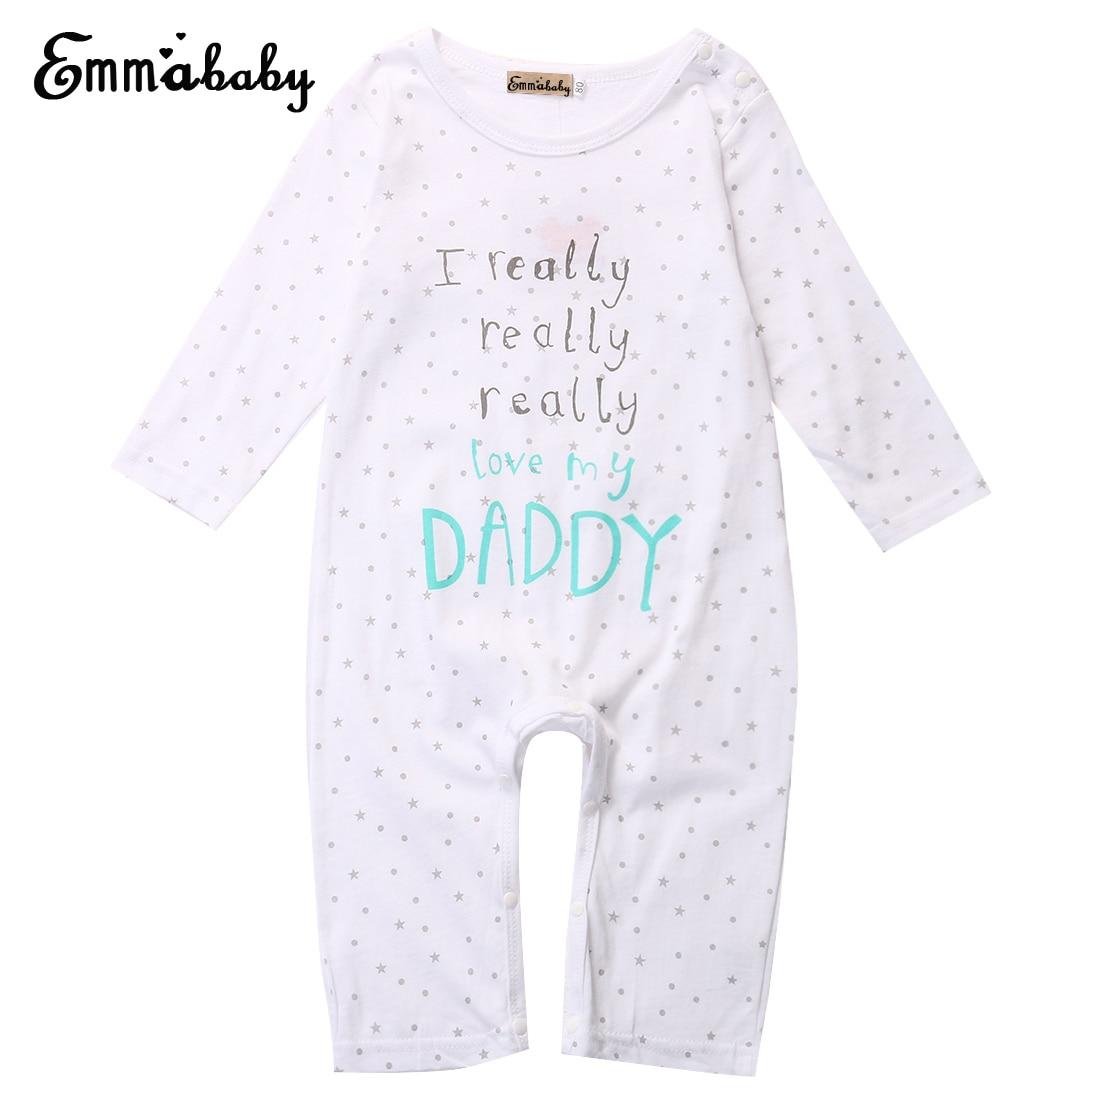 9f11fb2ed6eea Baby Clothes Baby Rompers I love Mum Dad Newborn Baby Boy Girl 100% Cotton  Long